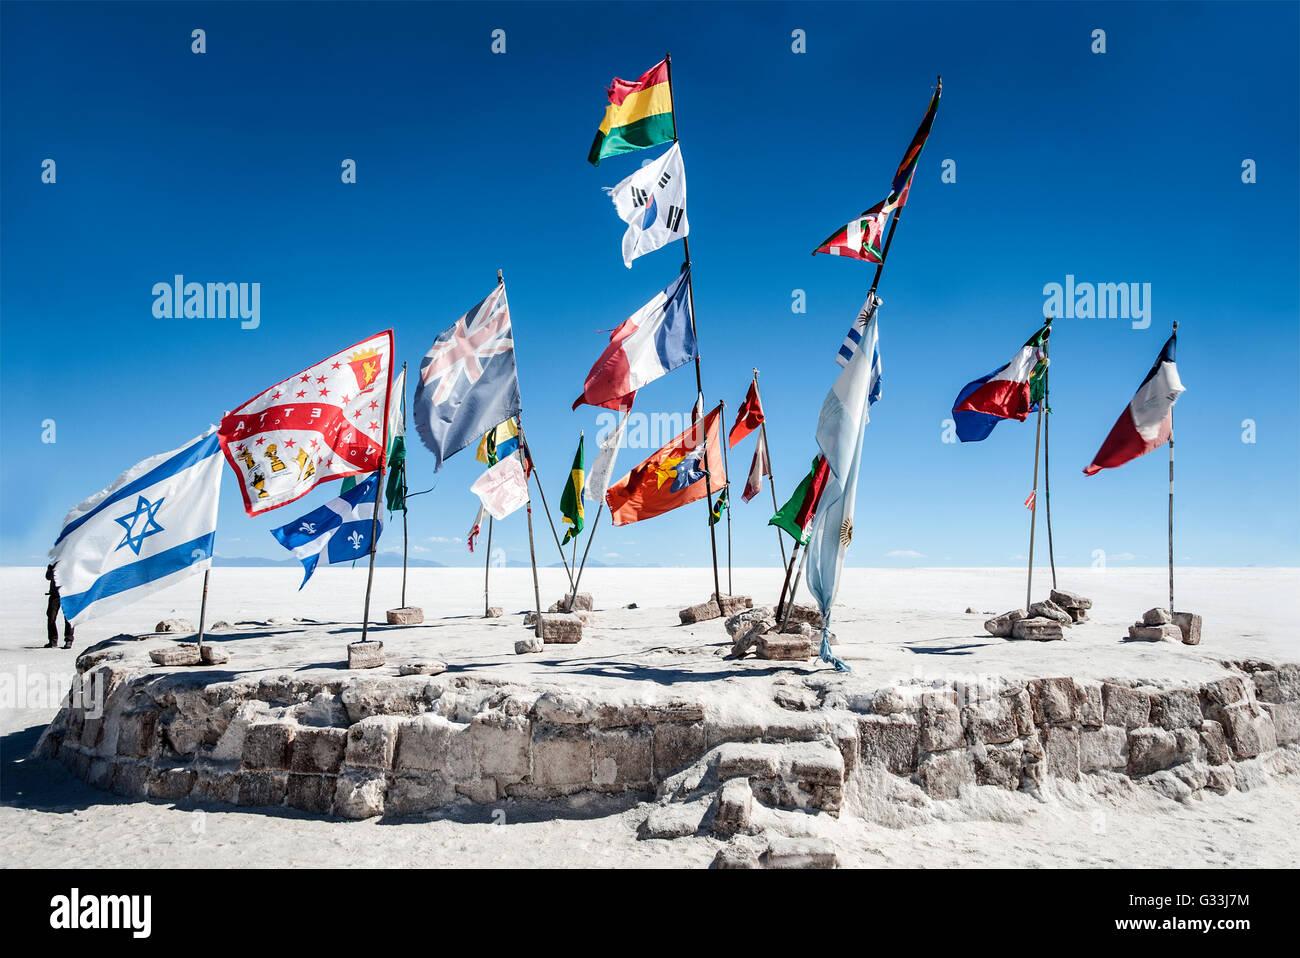 Salt lake - Salar de Uyuni in Bolivia - Stock Image